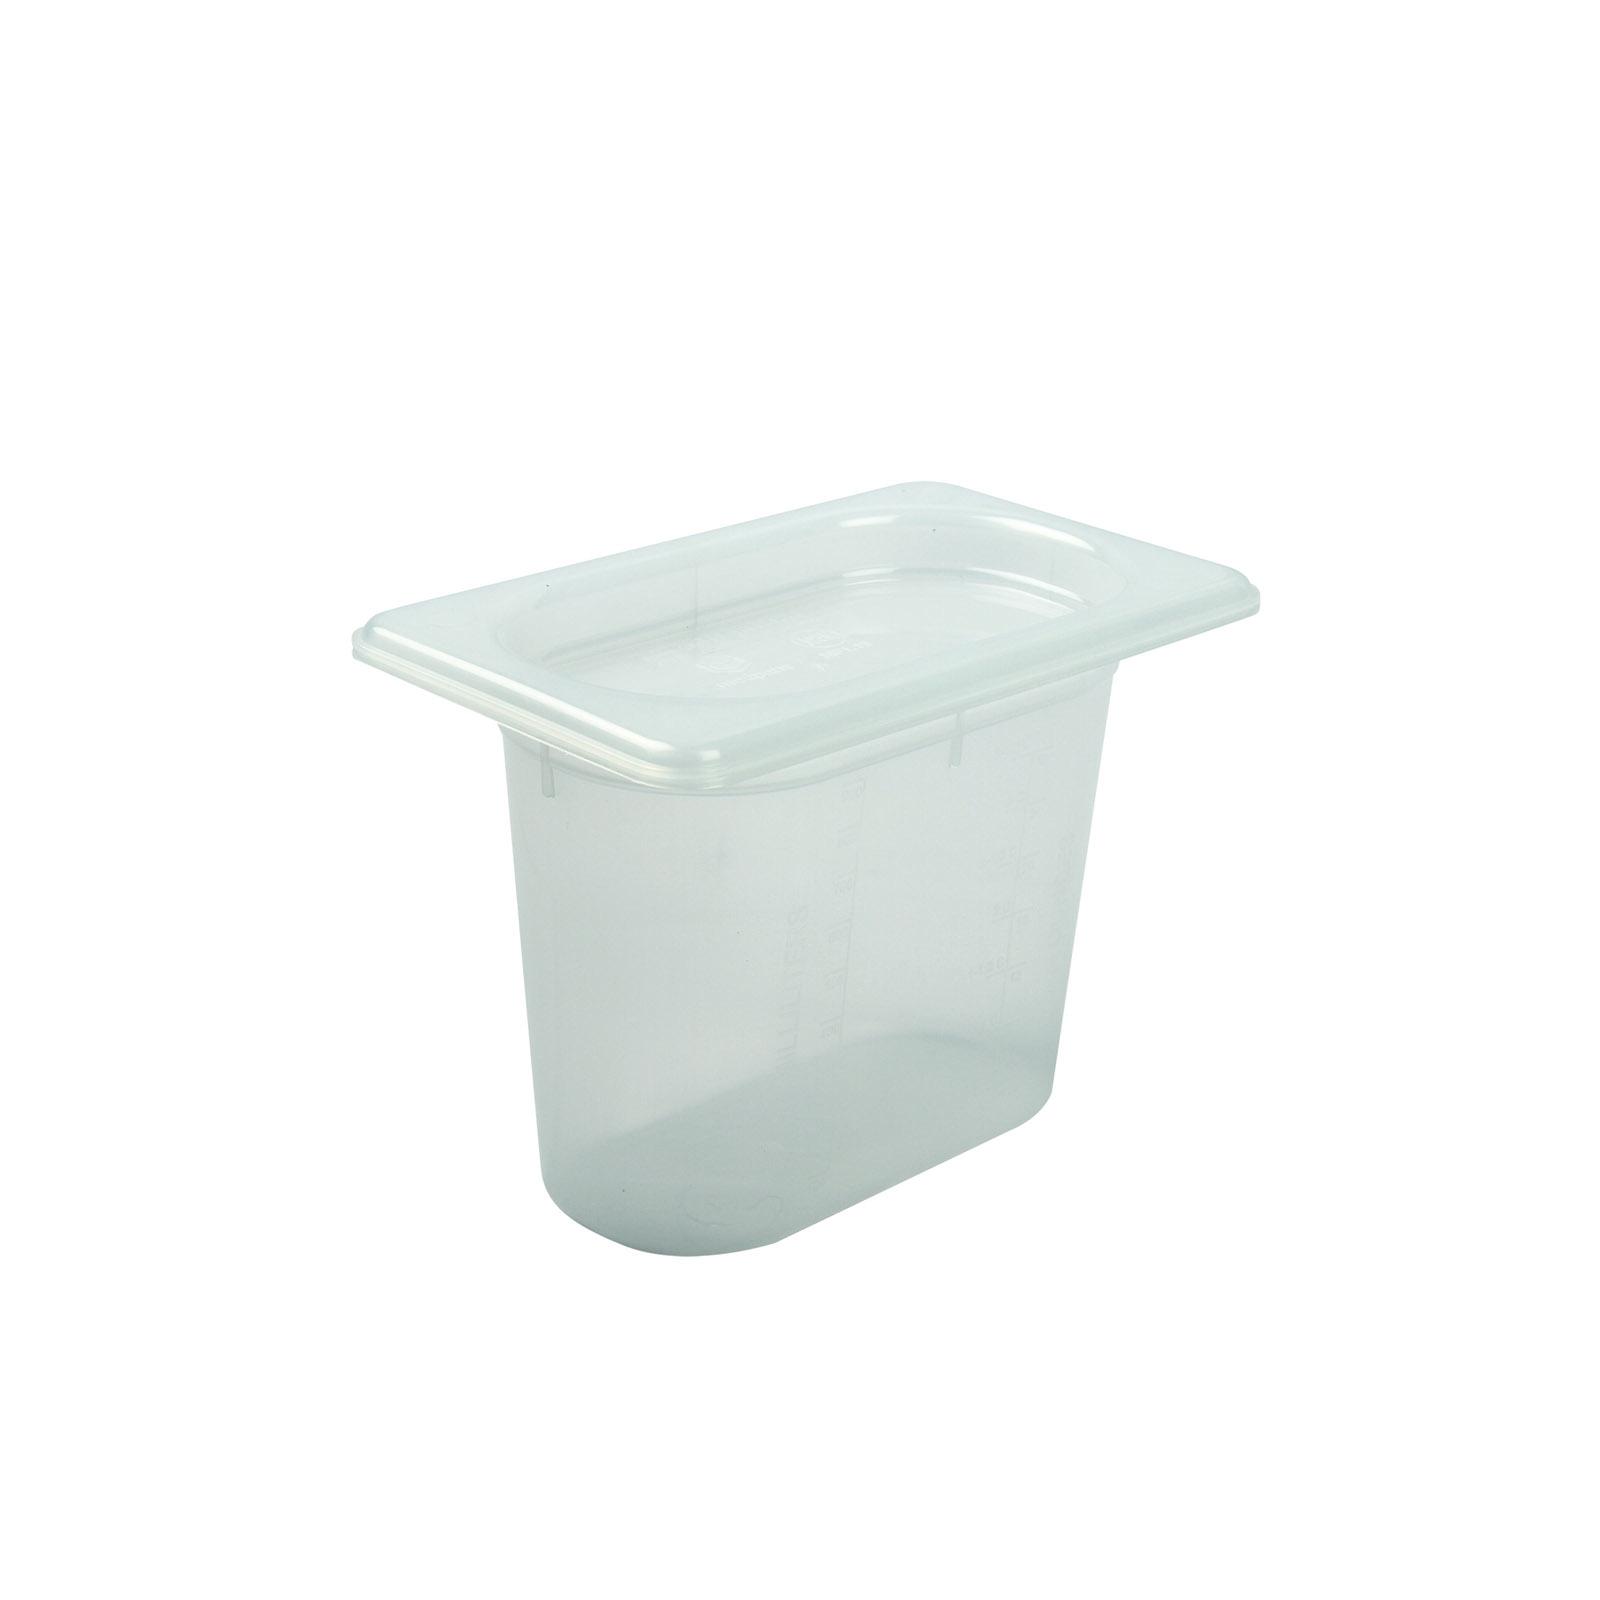 San Jamar MP19RD food pan, plastic